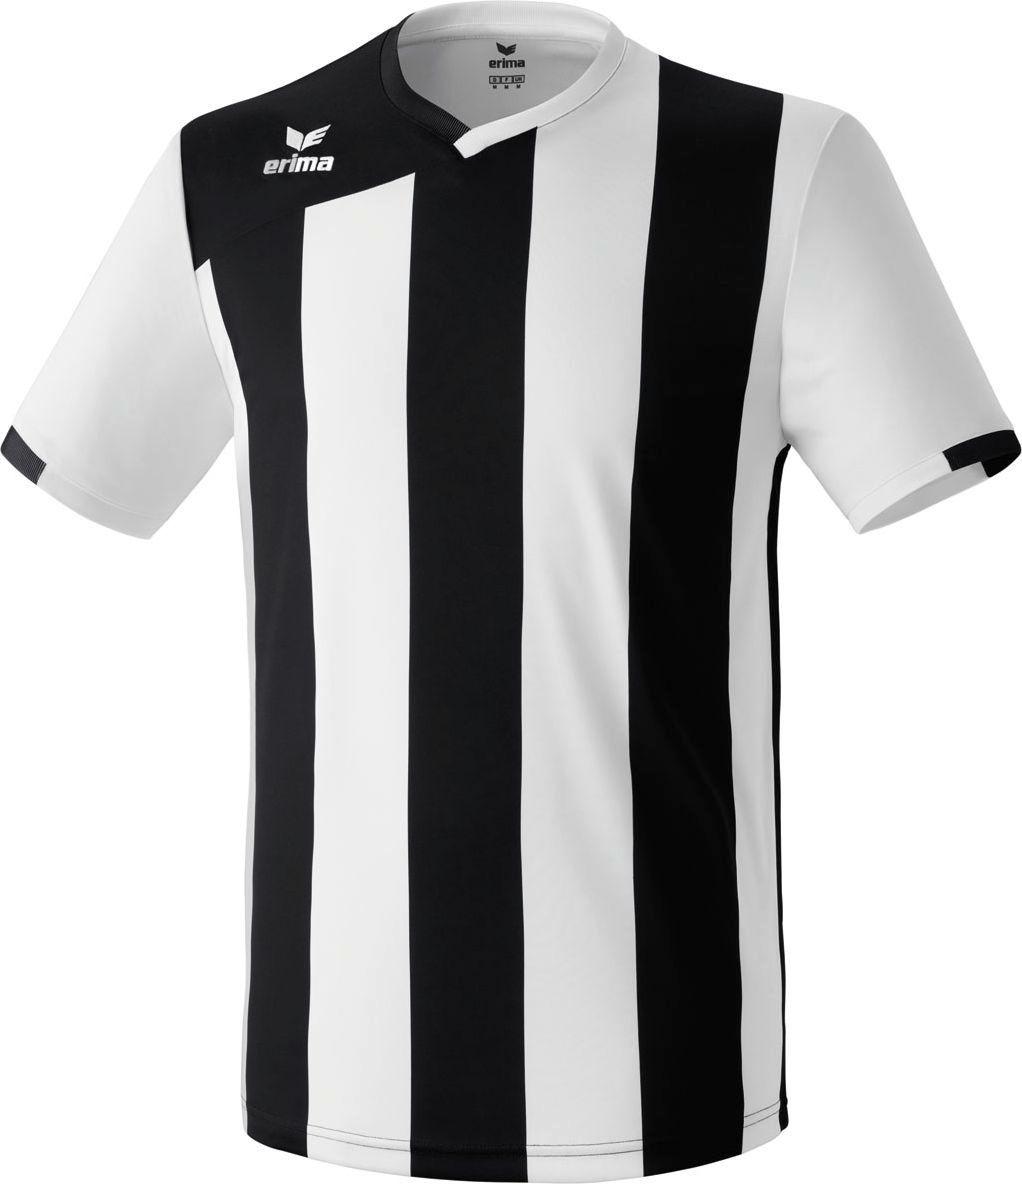 8b636eb5fbeaa2 Erima Siena 2.0 Shirt Korte Mouw - Wit / Zwart